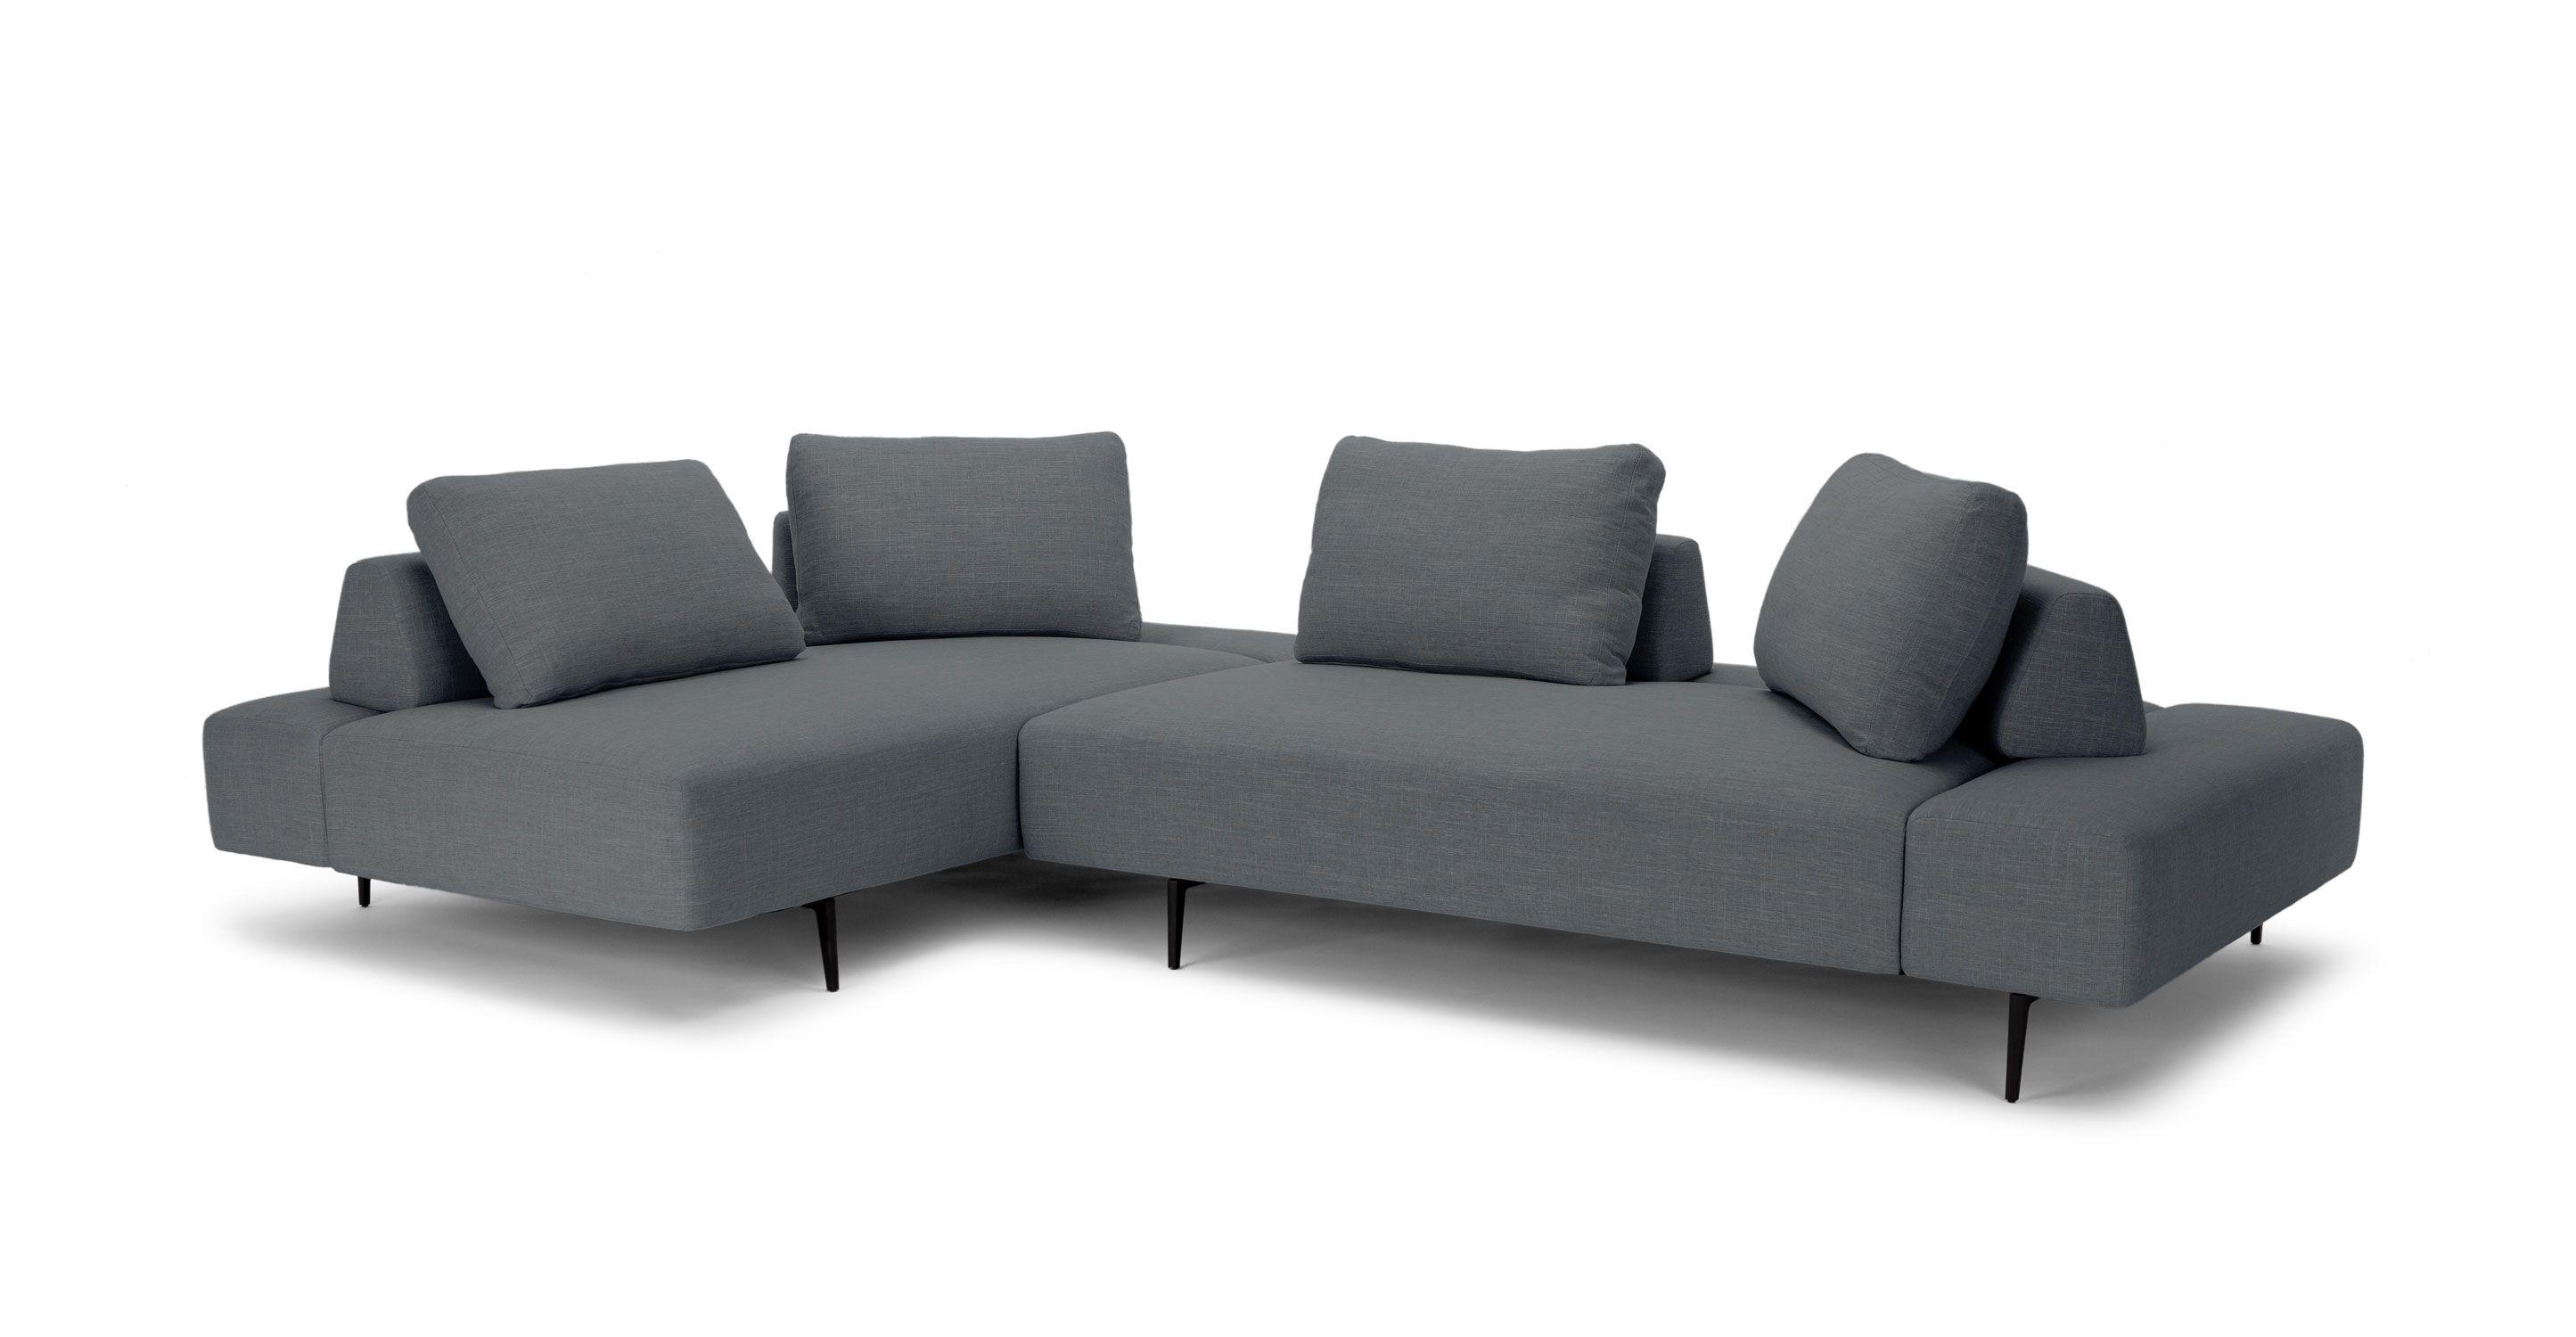 Grey Modern Sectional Upholstered Divan Modern Furniture